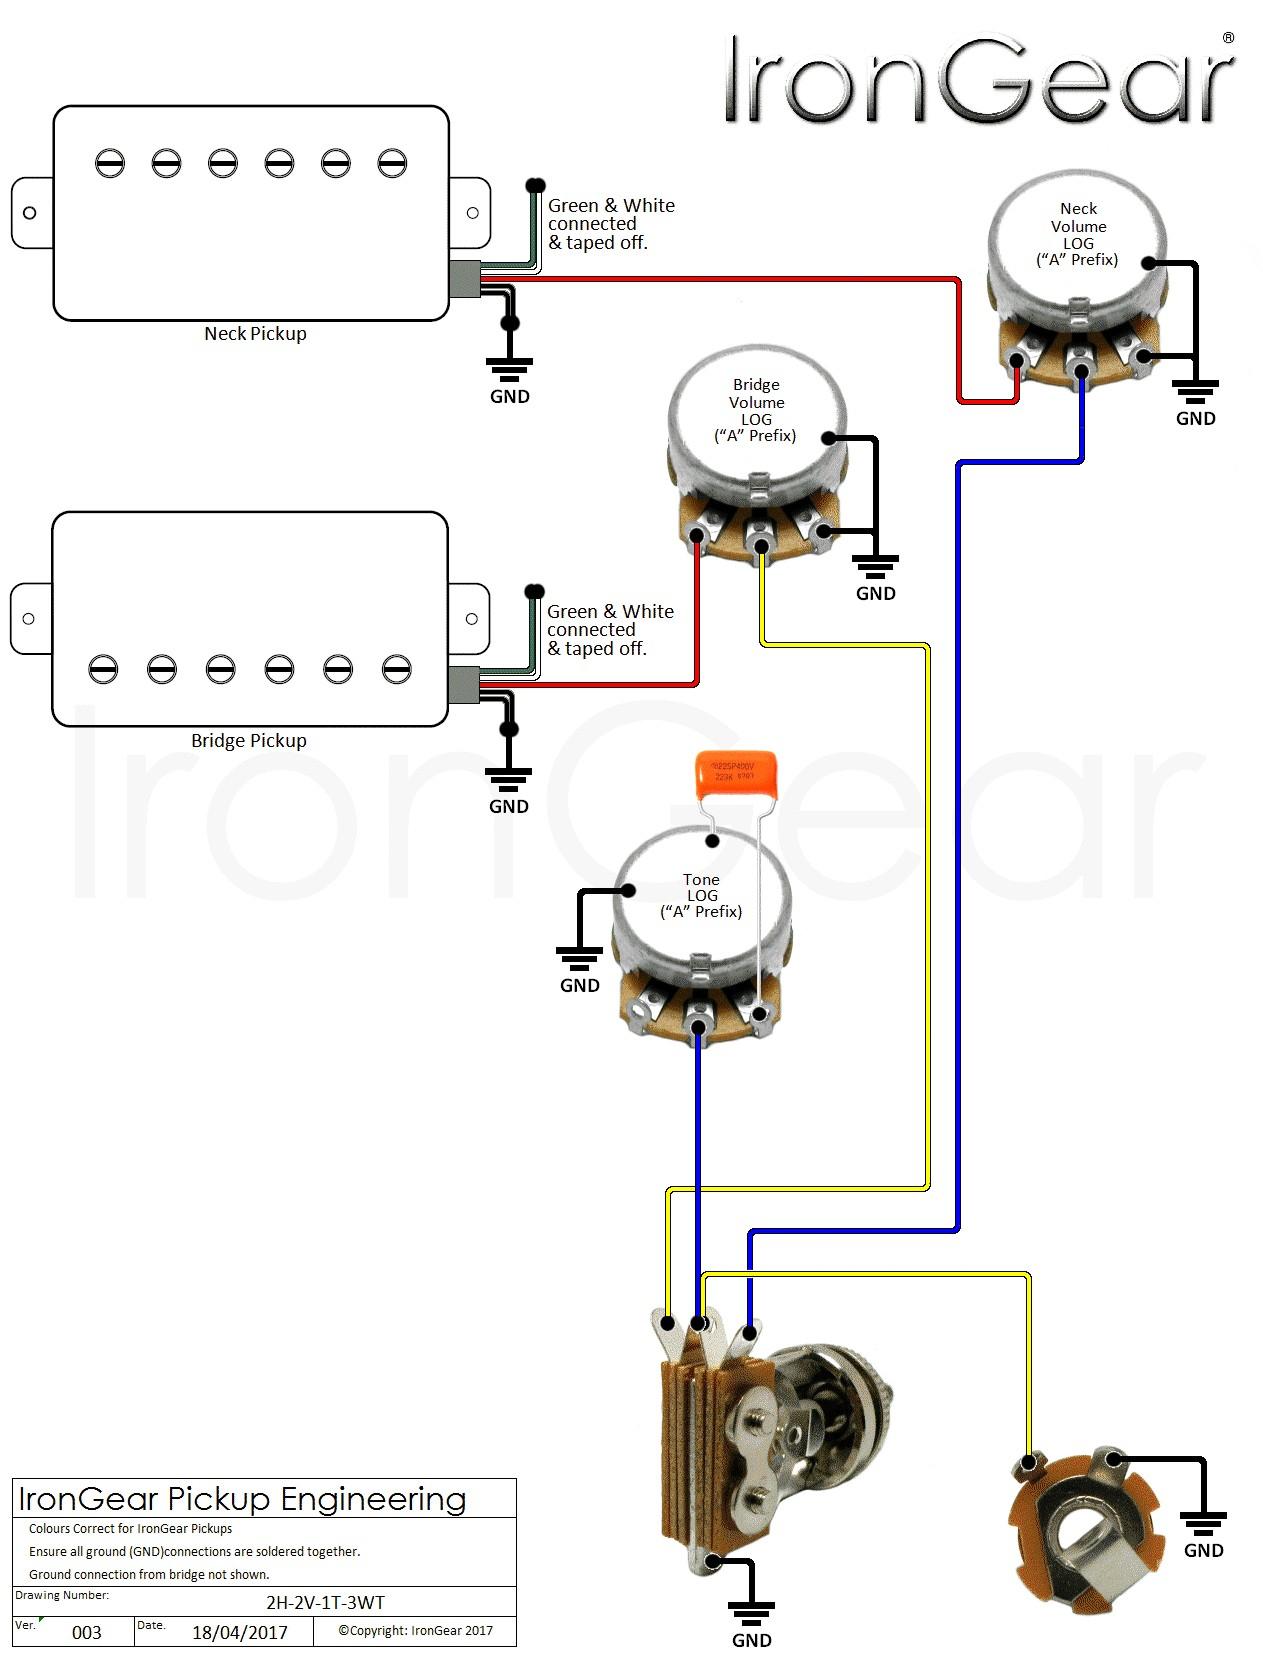 bass wiring diagram 2 volume 2 tone Download-Wiring Diagram For A Guitar  Fresh Wiring